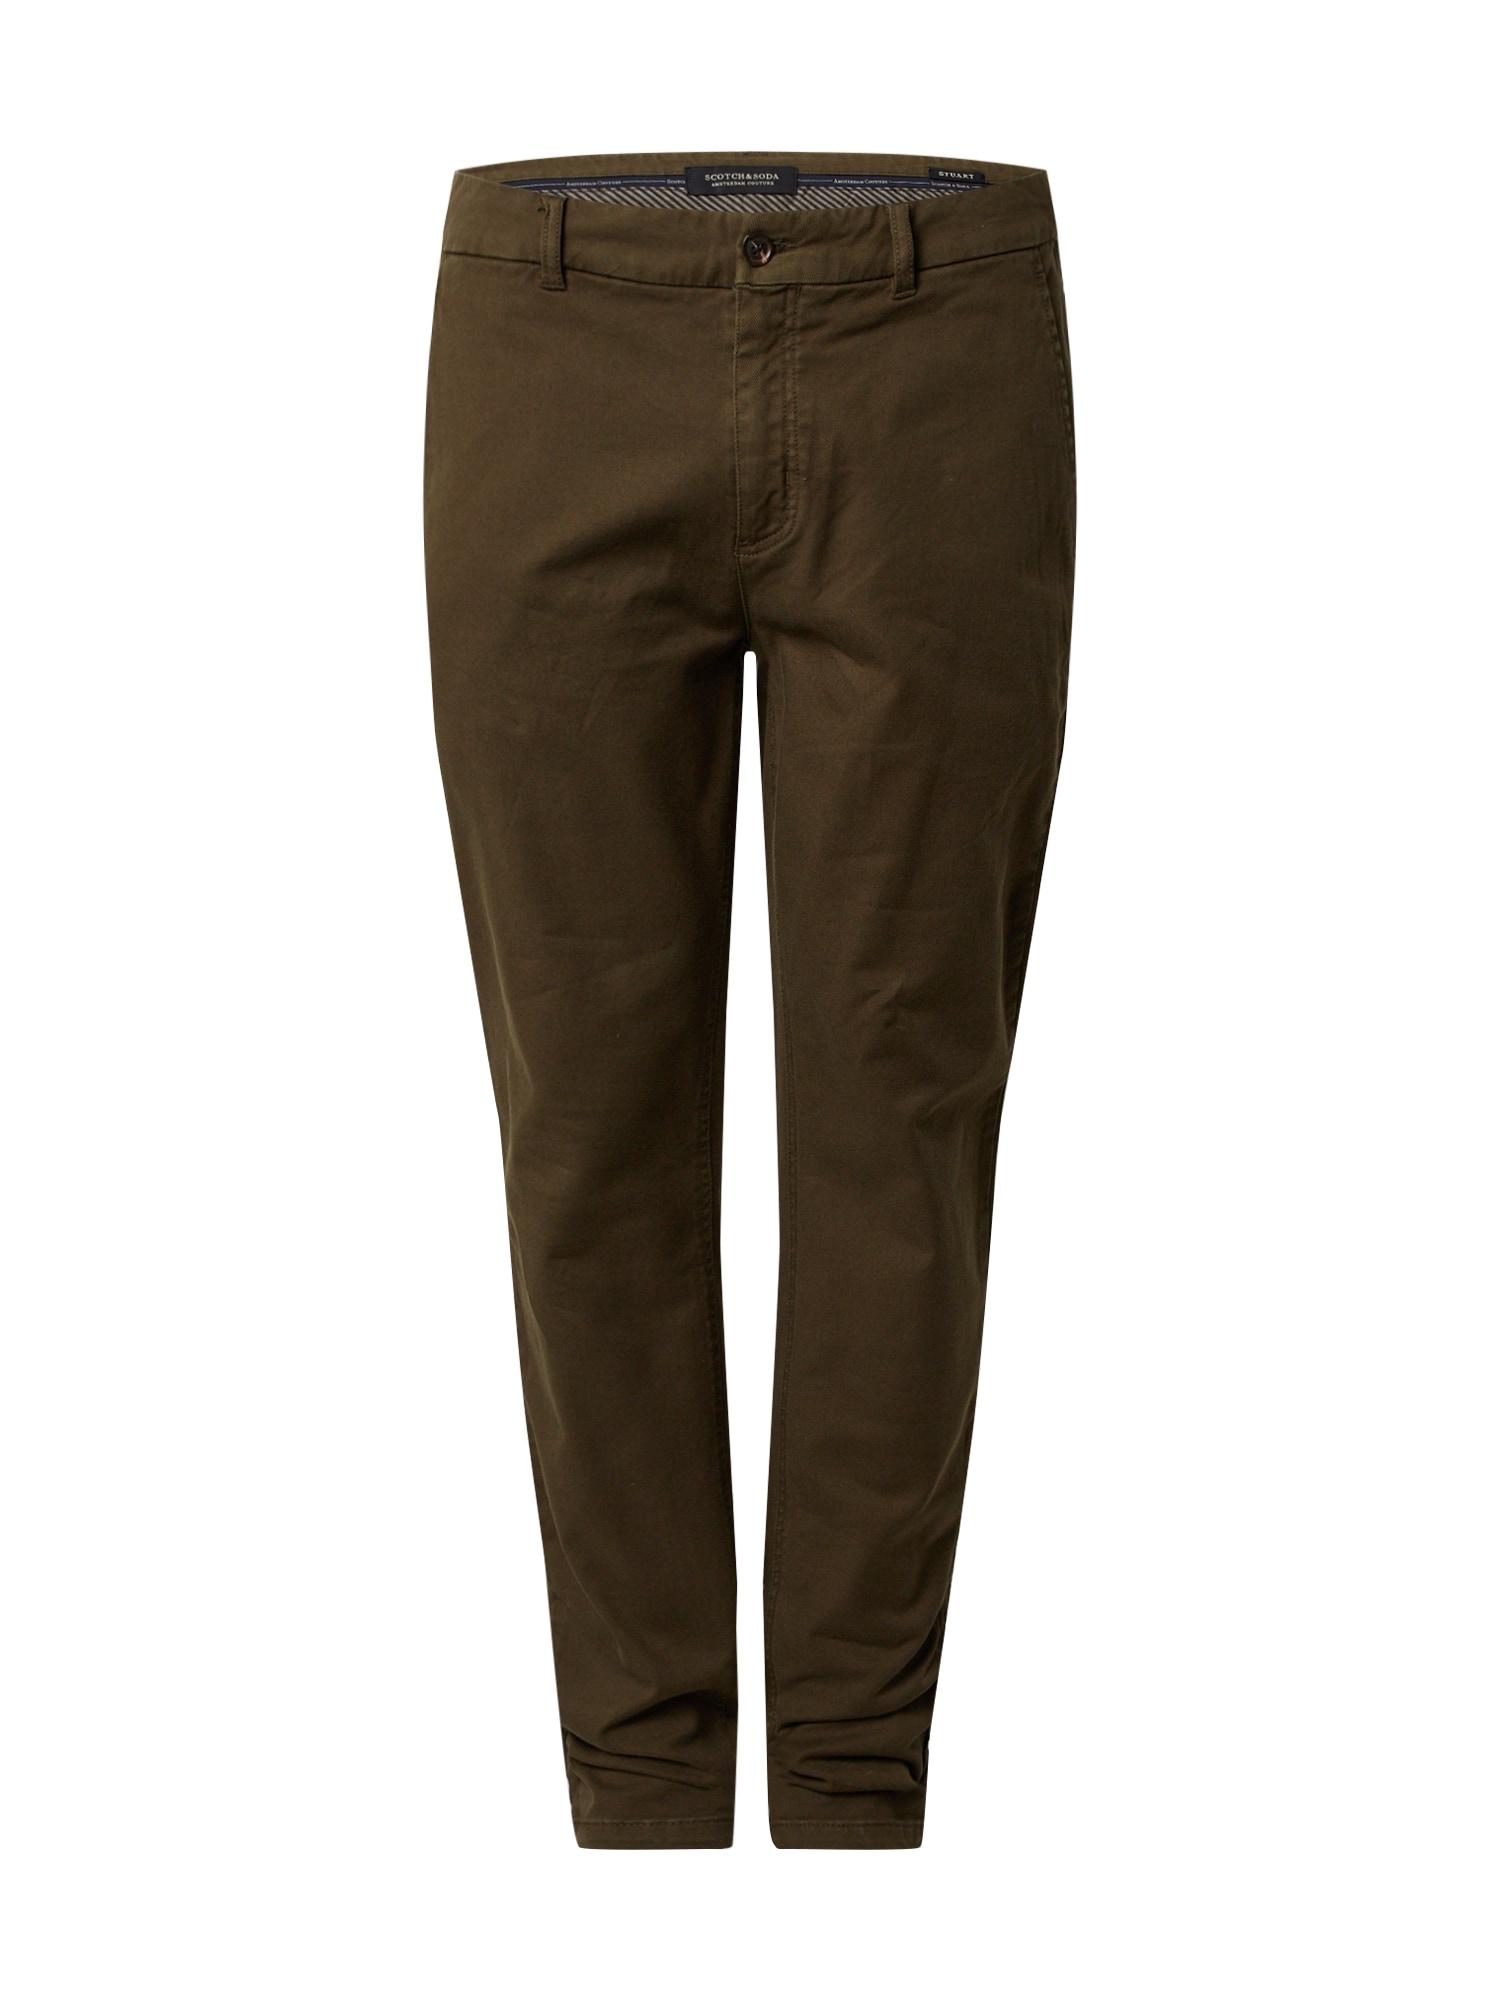 SCOTCH & SODA Chino kalhoty 'STUART'  khaki